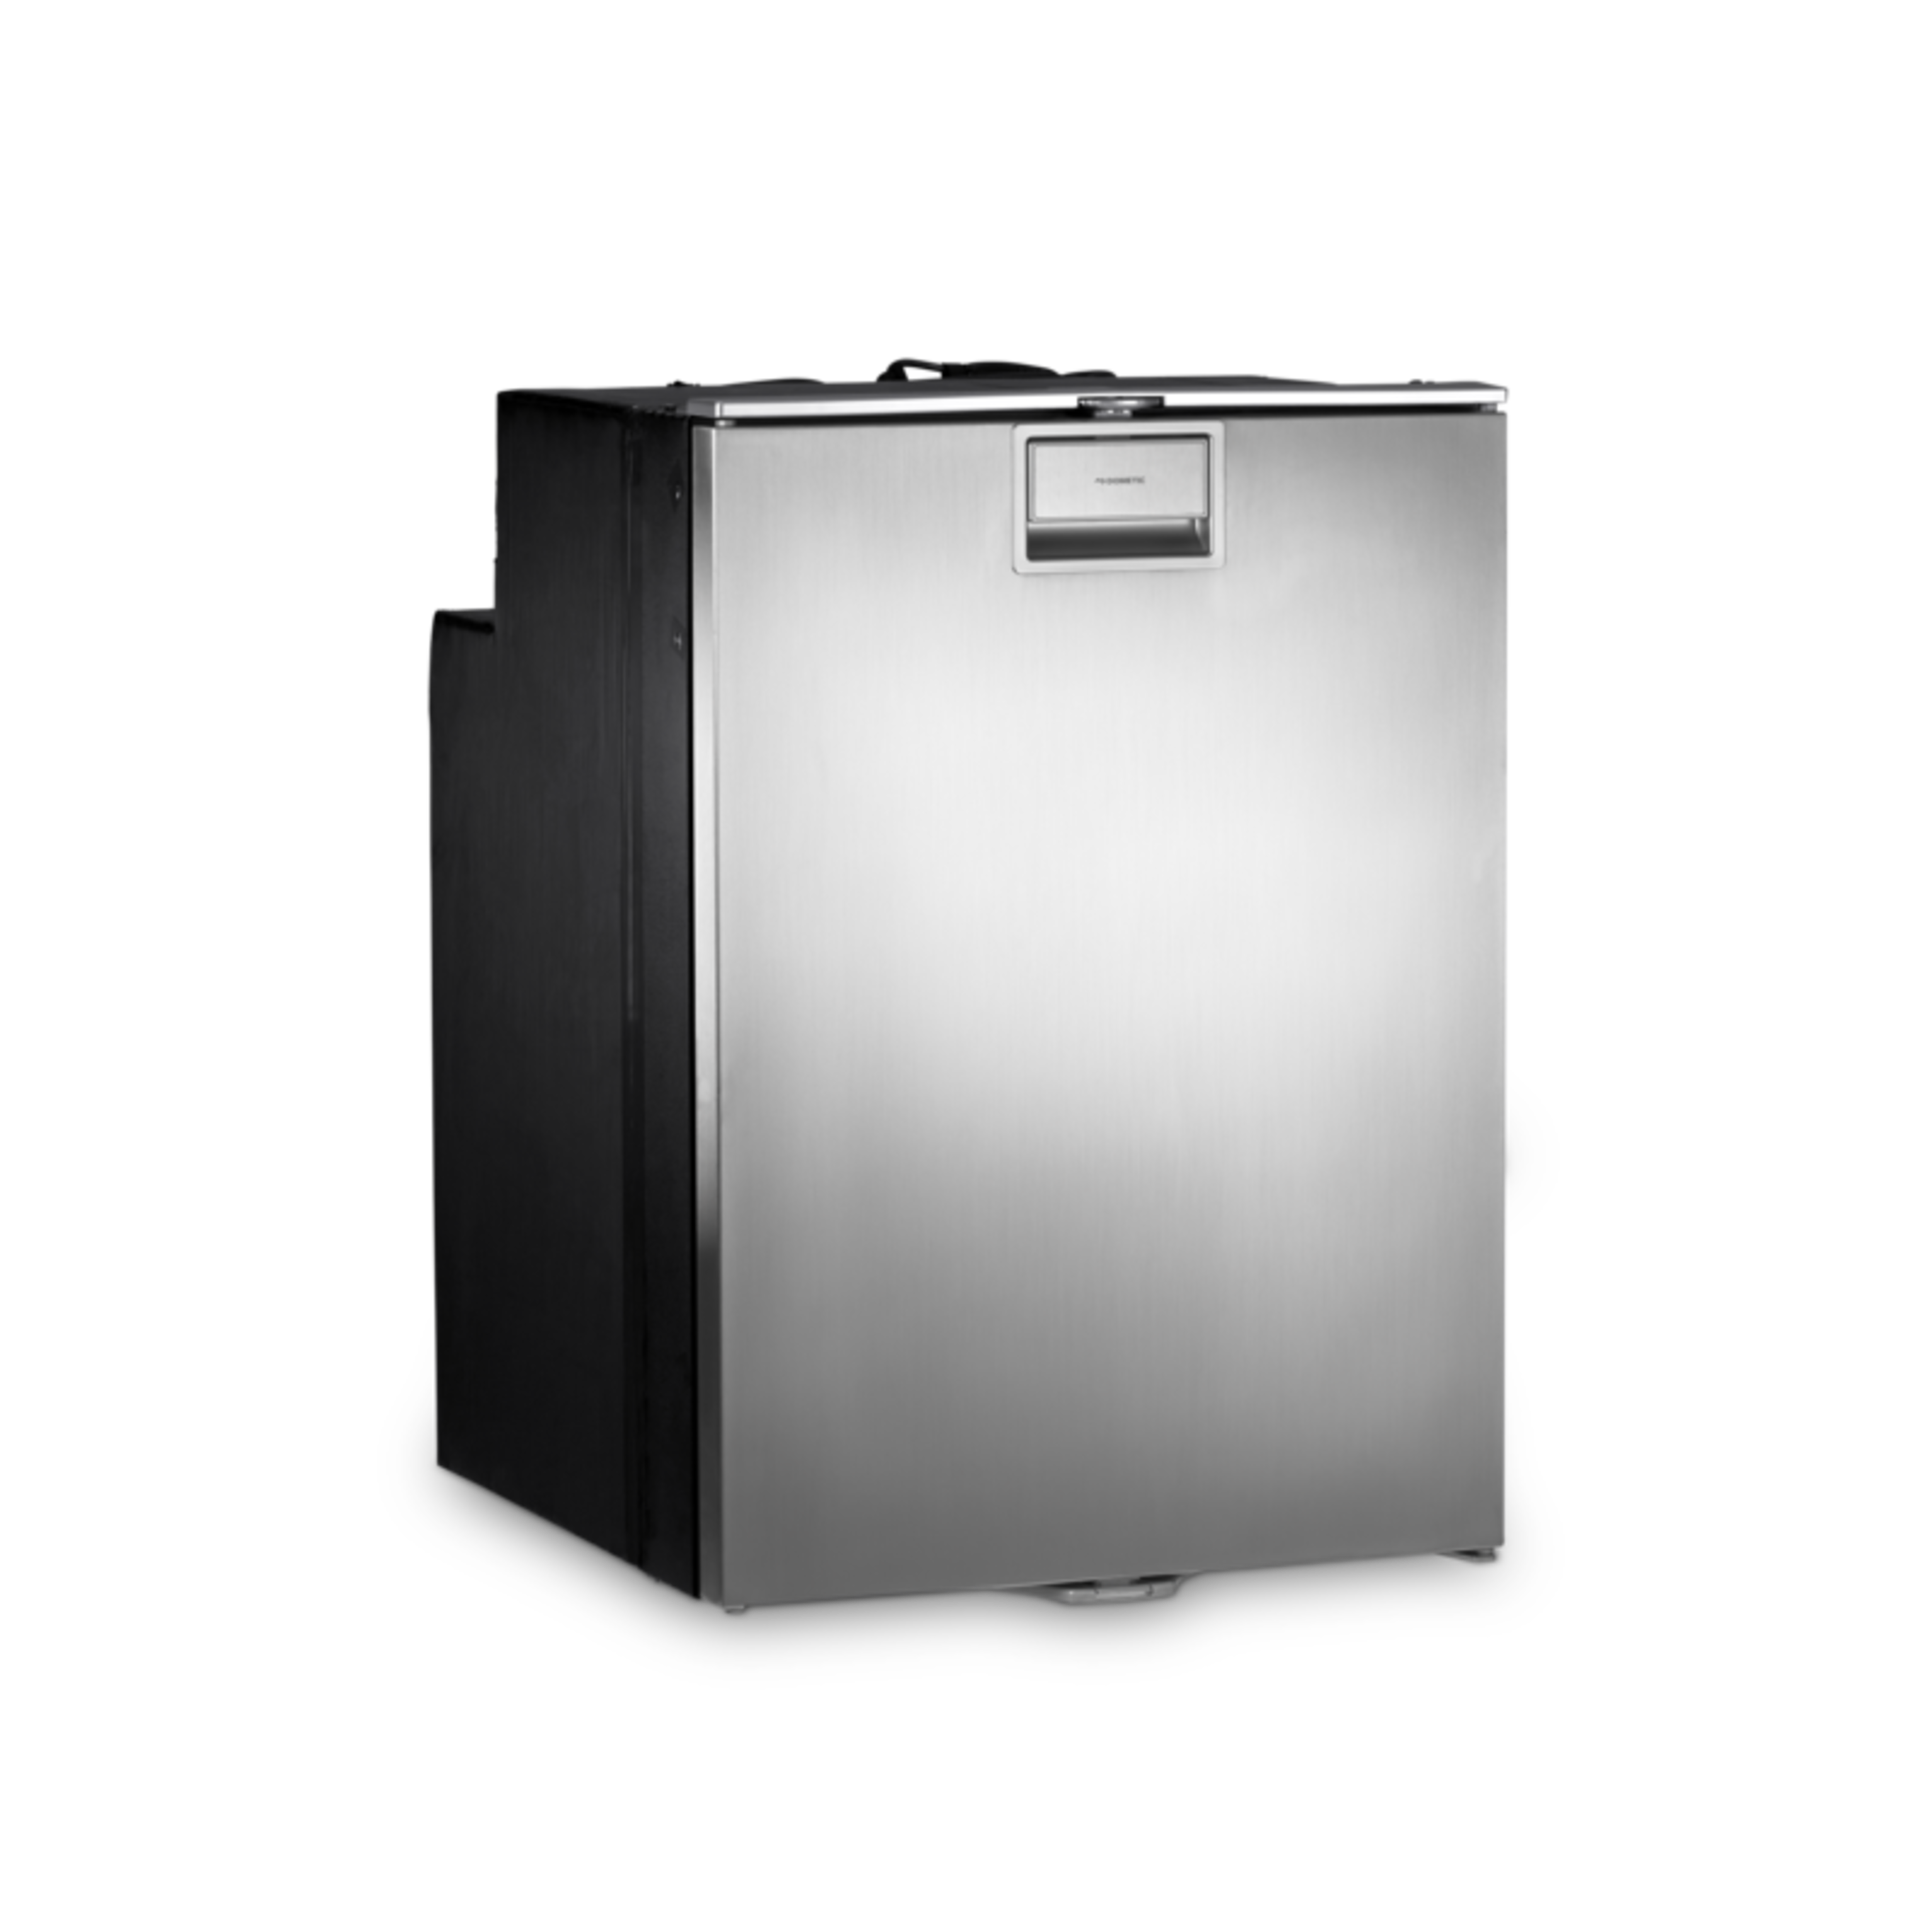 Dometic CoolMatic CRX 110 S